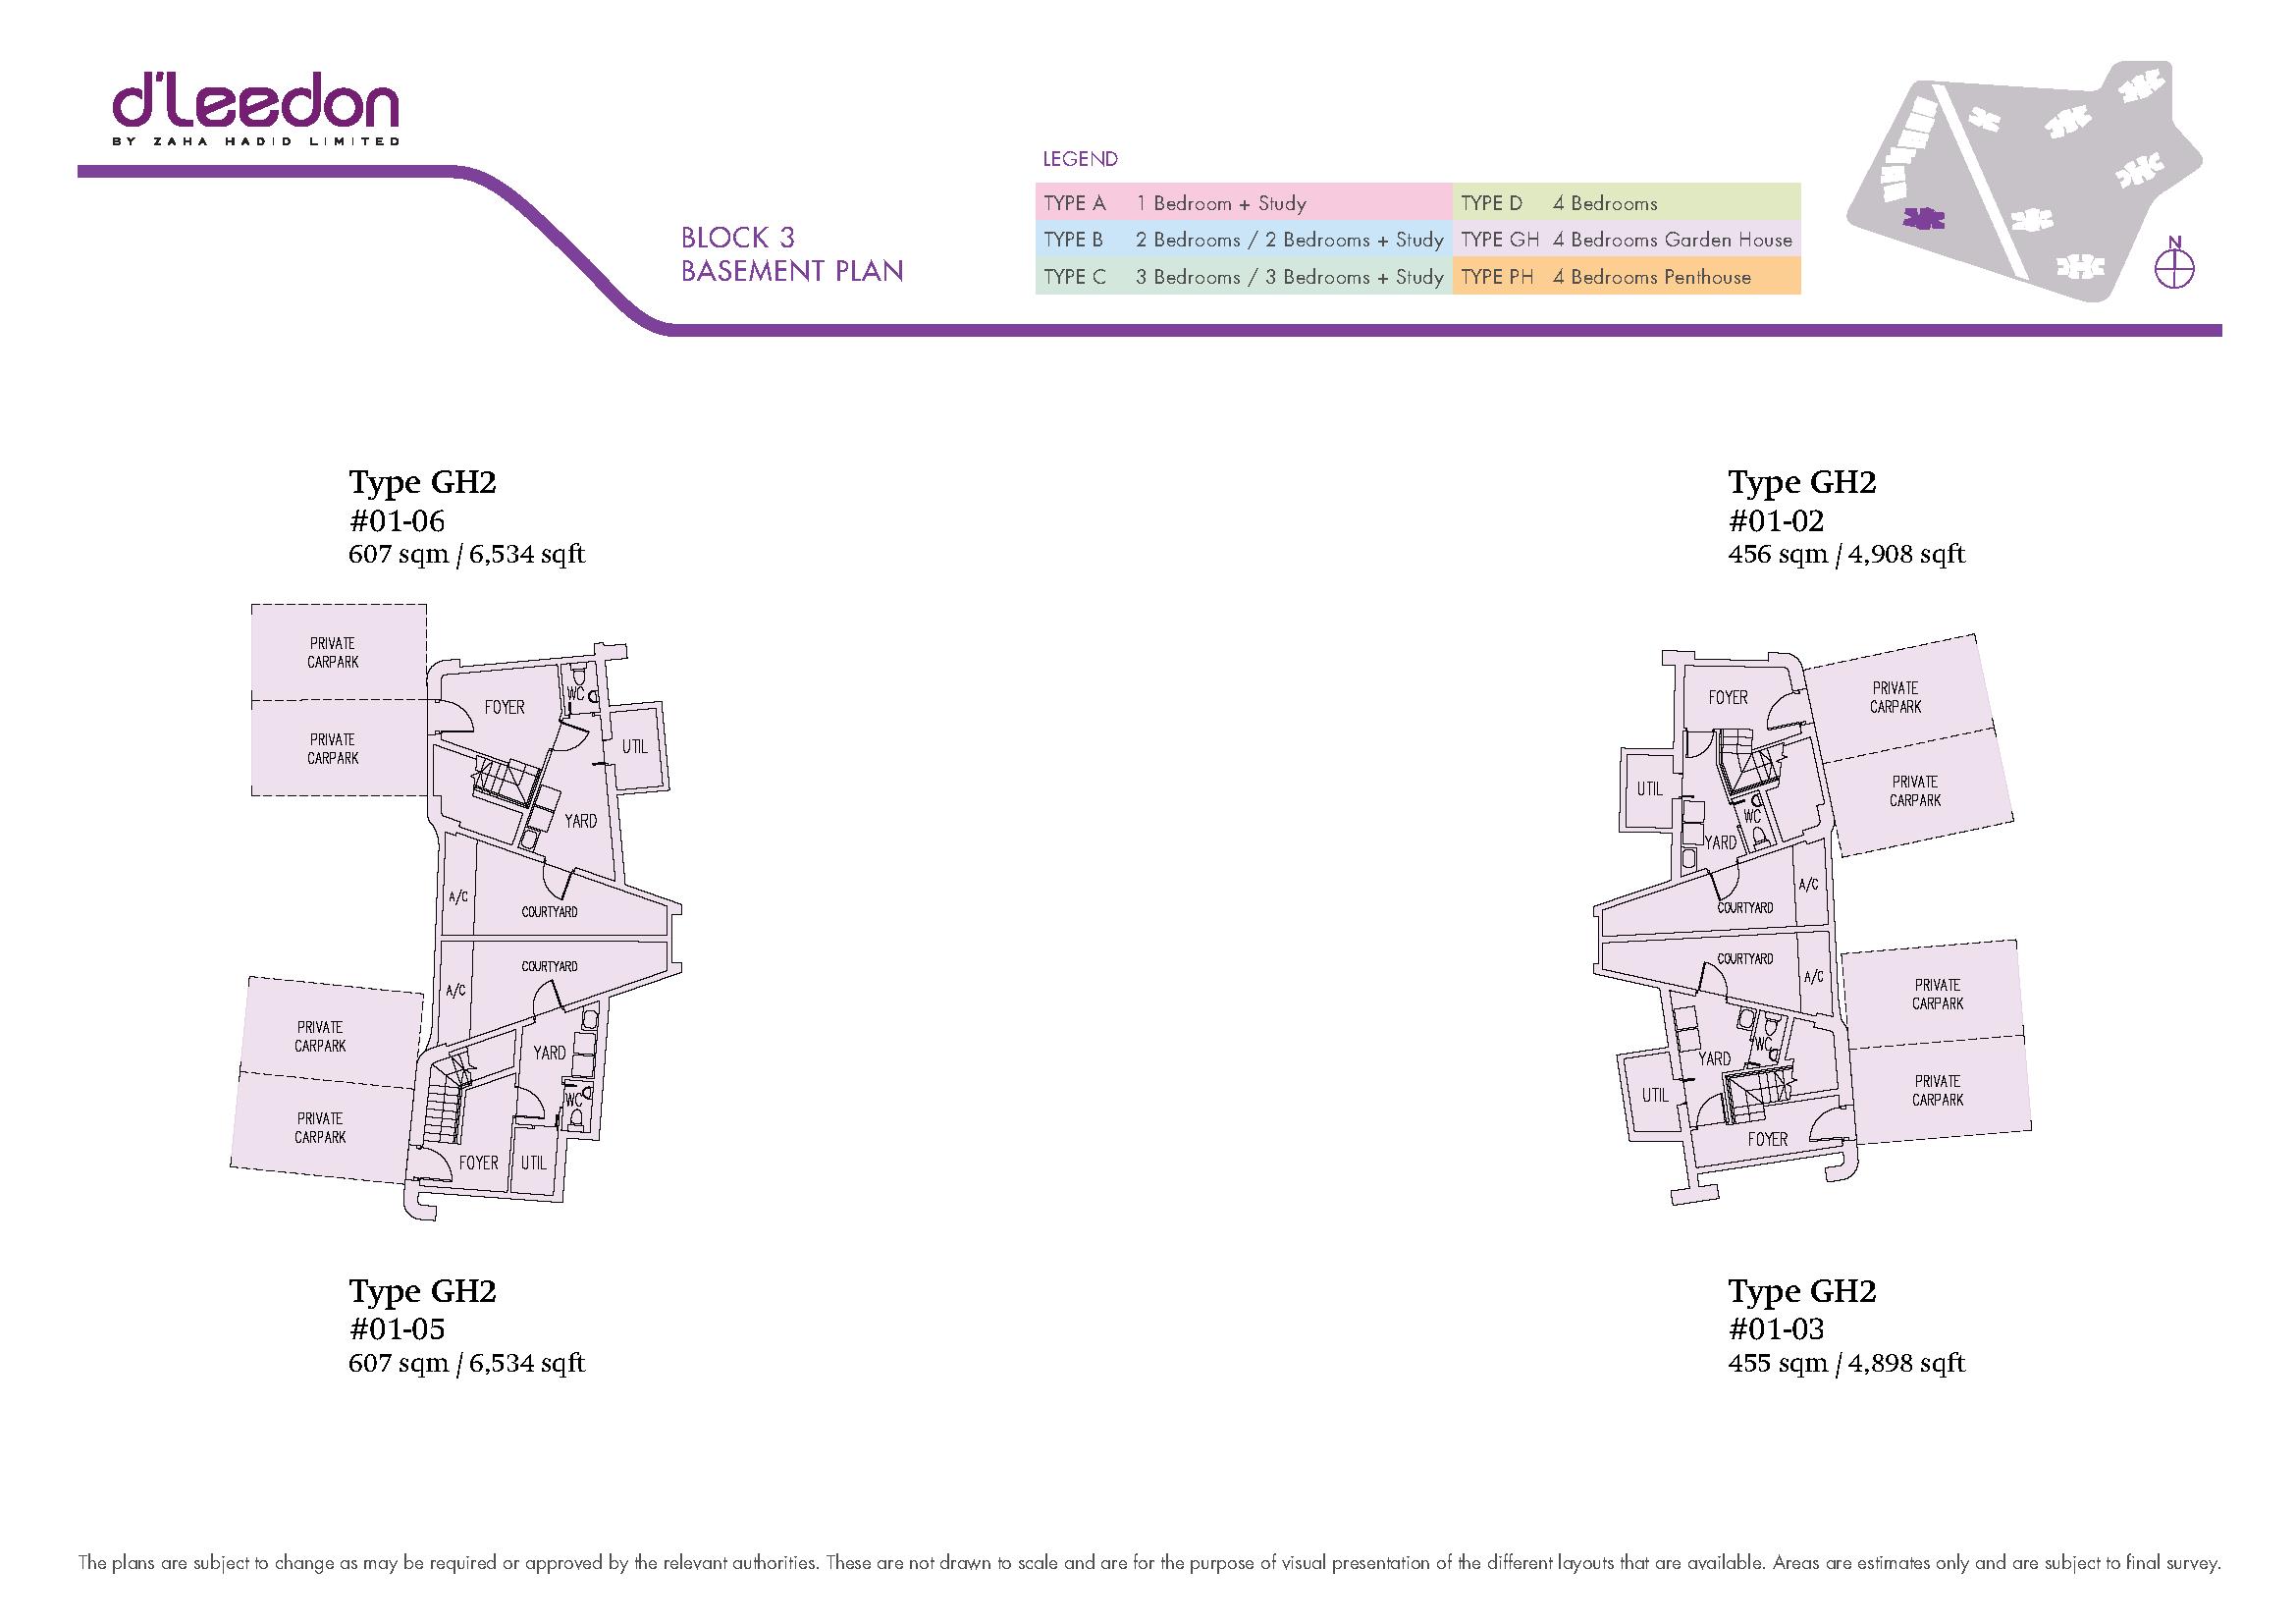 Garden villas at d leedon - Floor Plan